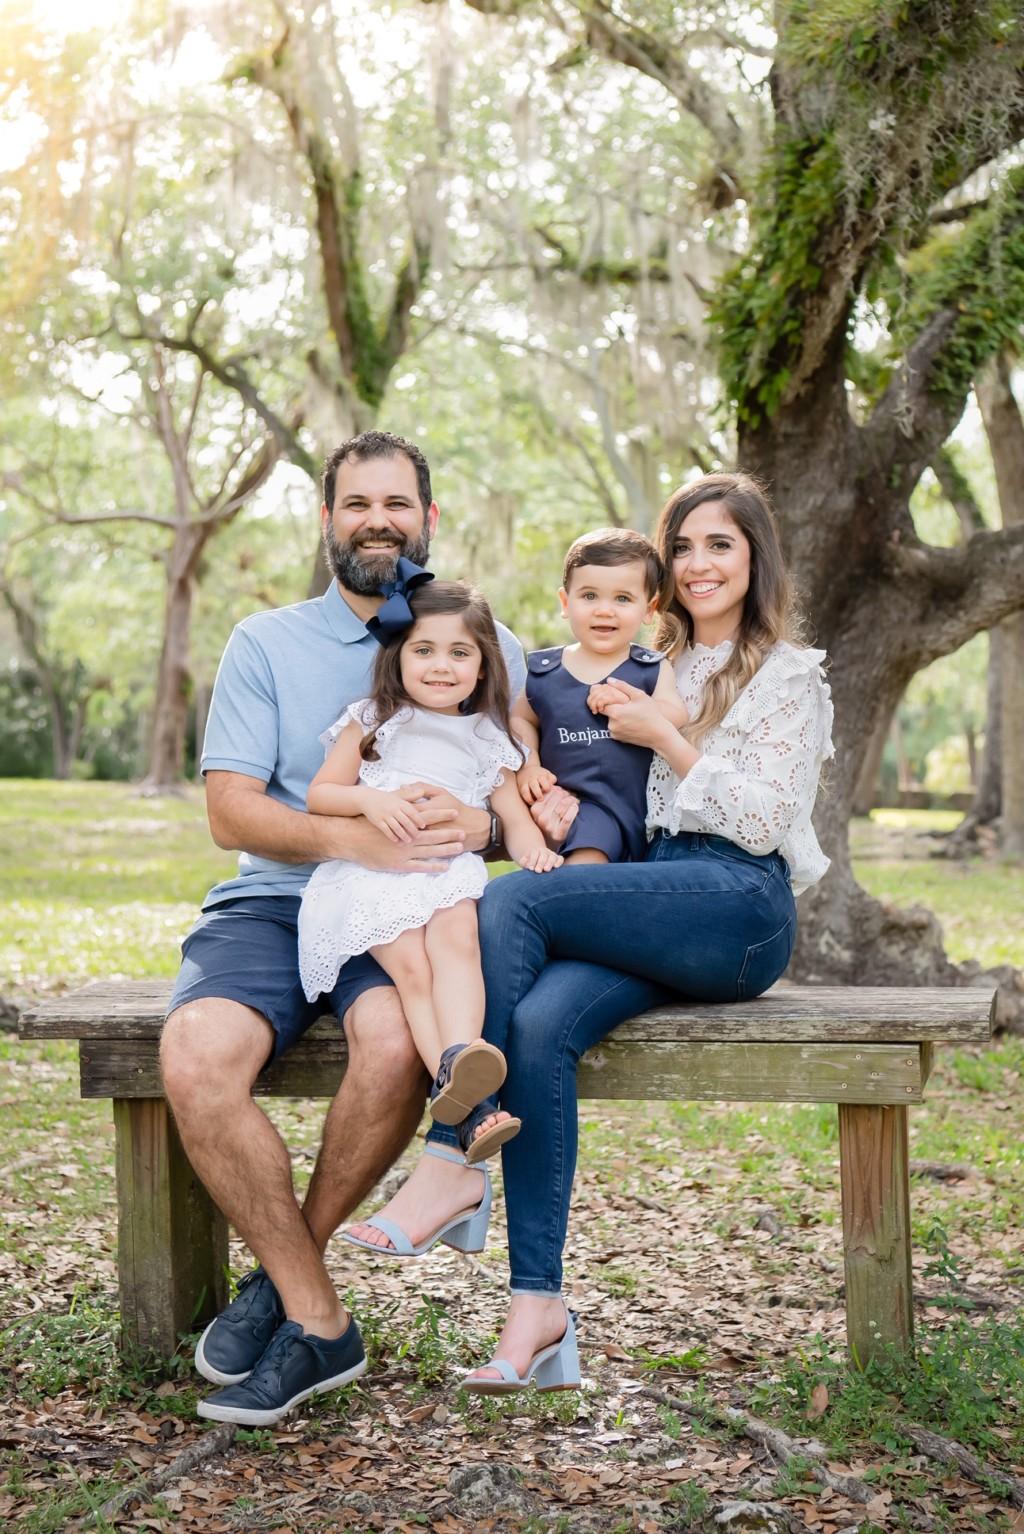 Miami Moms Blog Welcomes: MIA Mom Becky Salgado Contributor